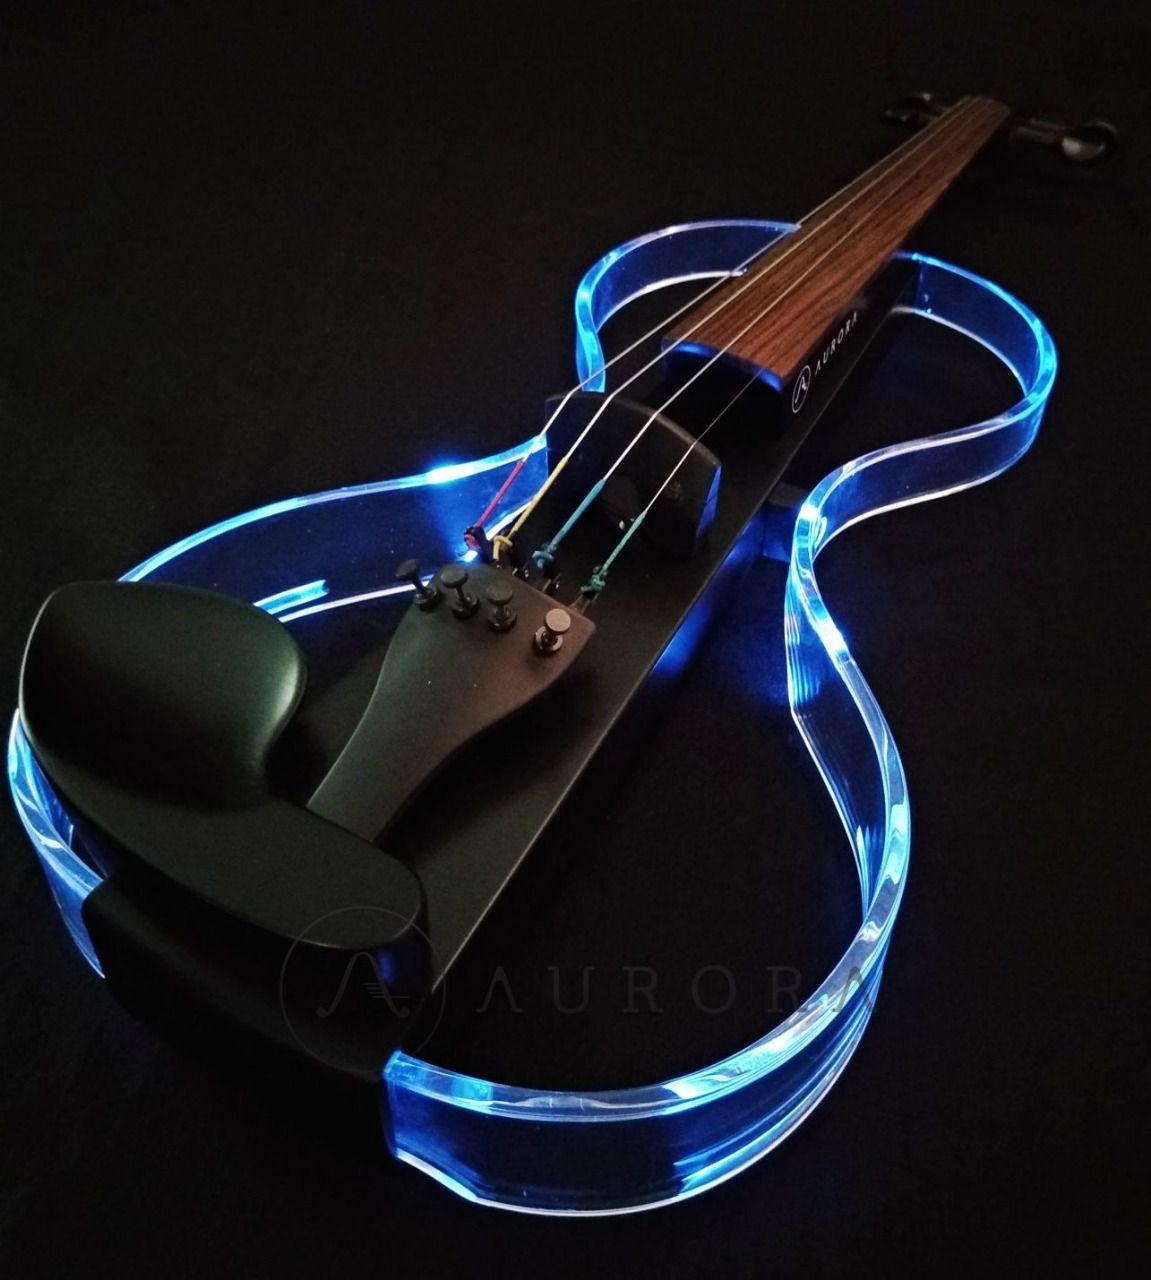 Violino Profissional 4/4 Elétrico Aurora Silhouette preto